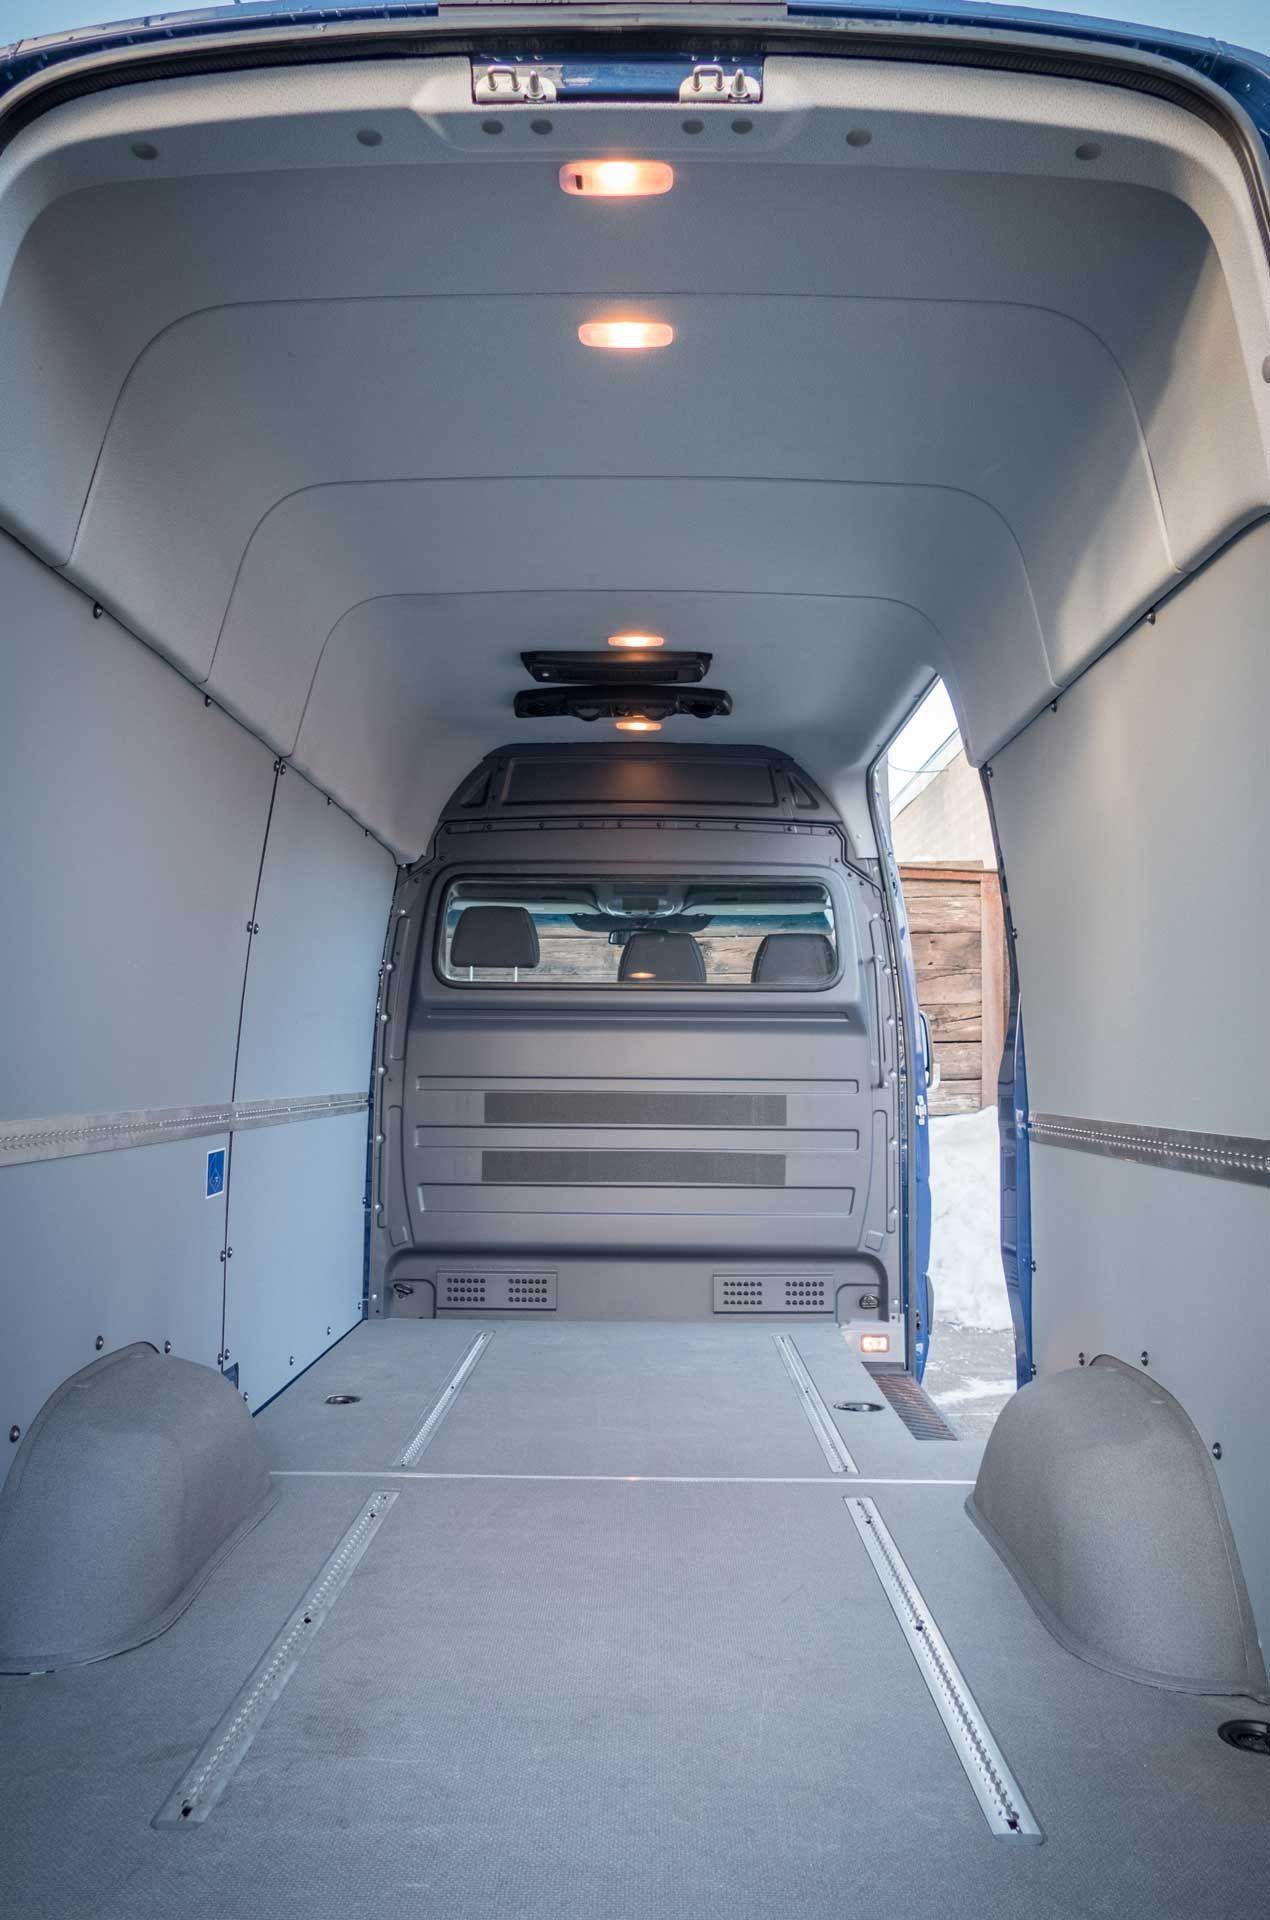 Cargo Van Roof Air Conditioner In 2020 Cargo Van Sprinter Van Air Conditioner